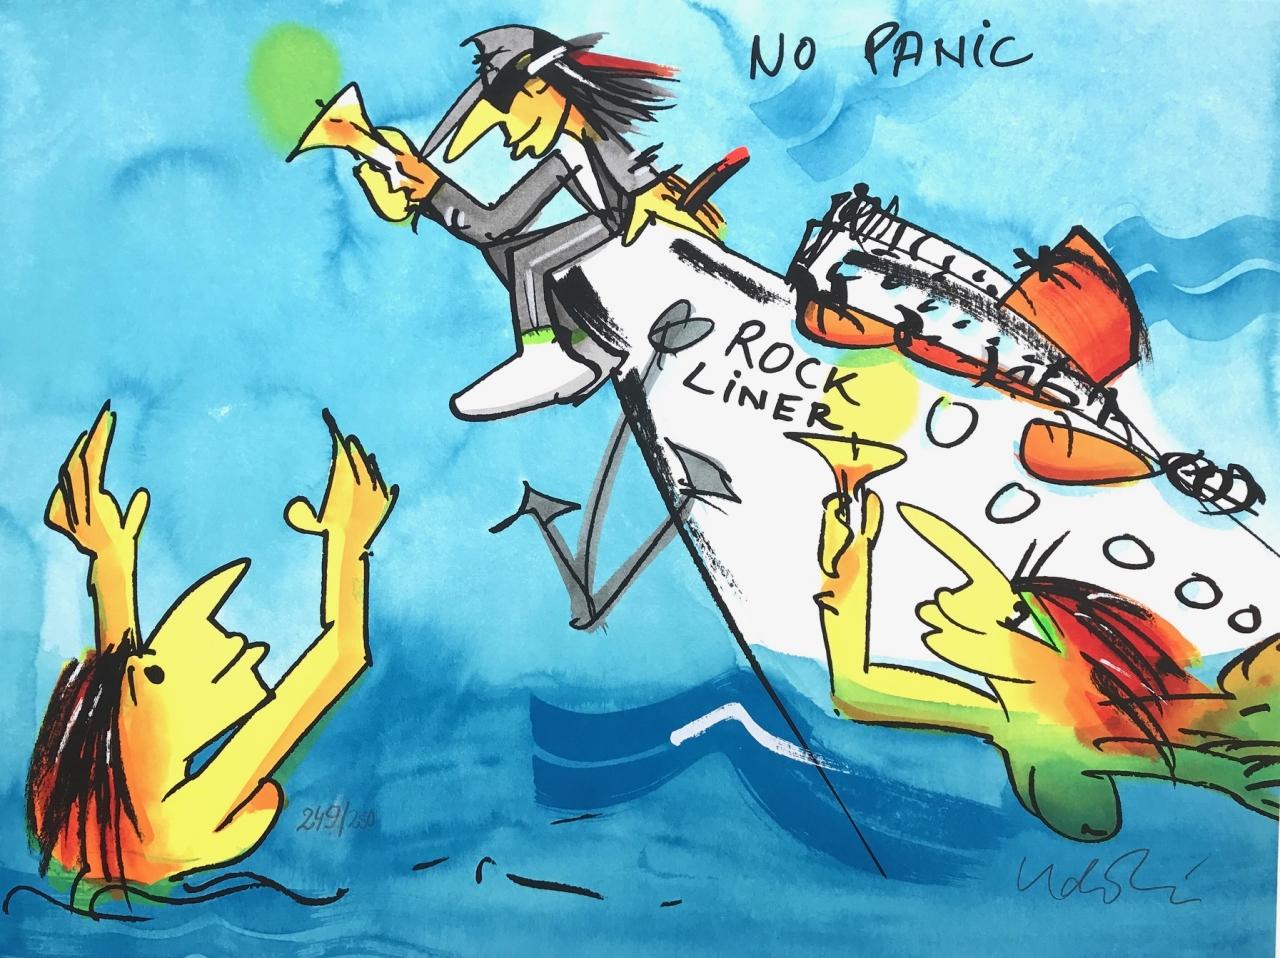 No Panic - Rockliner 2020